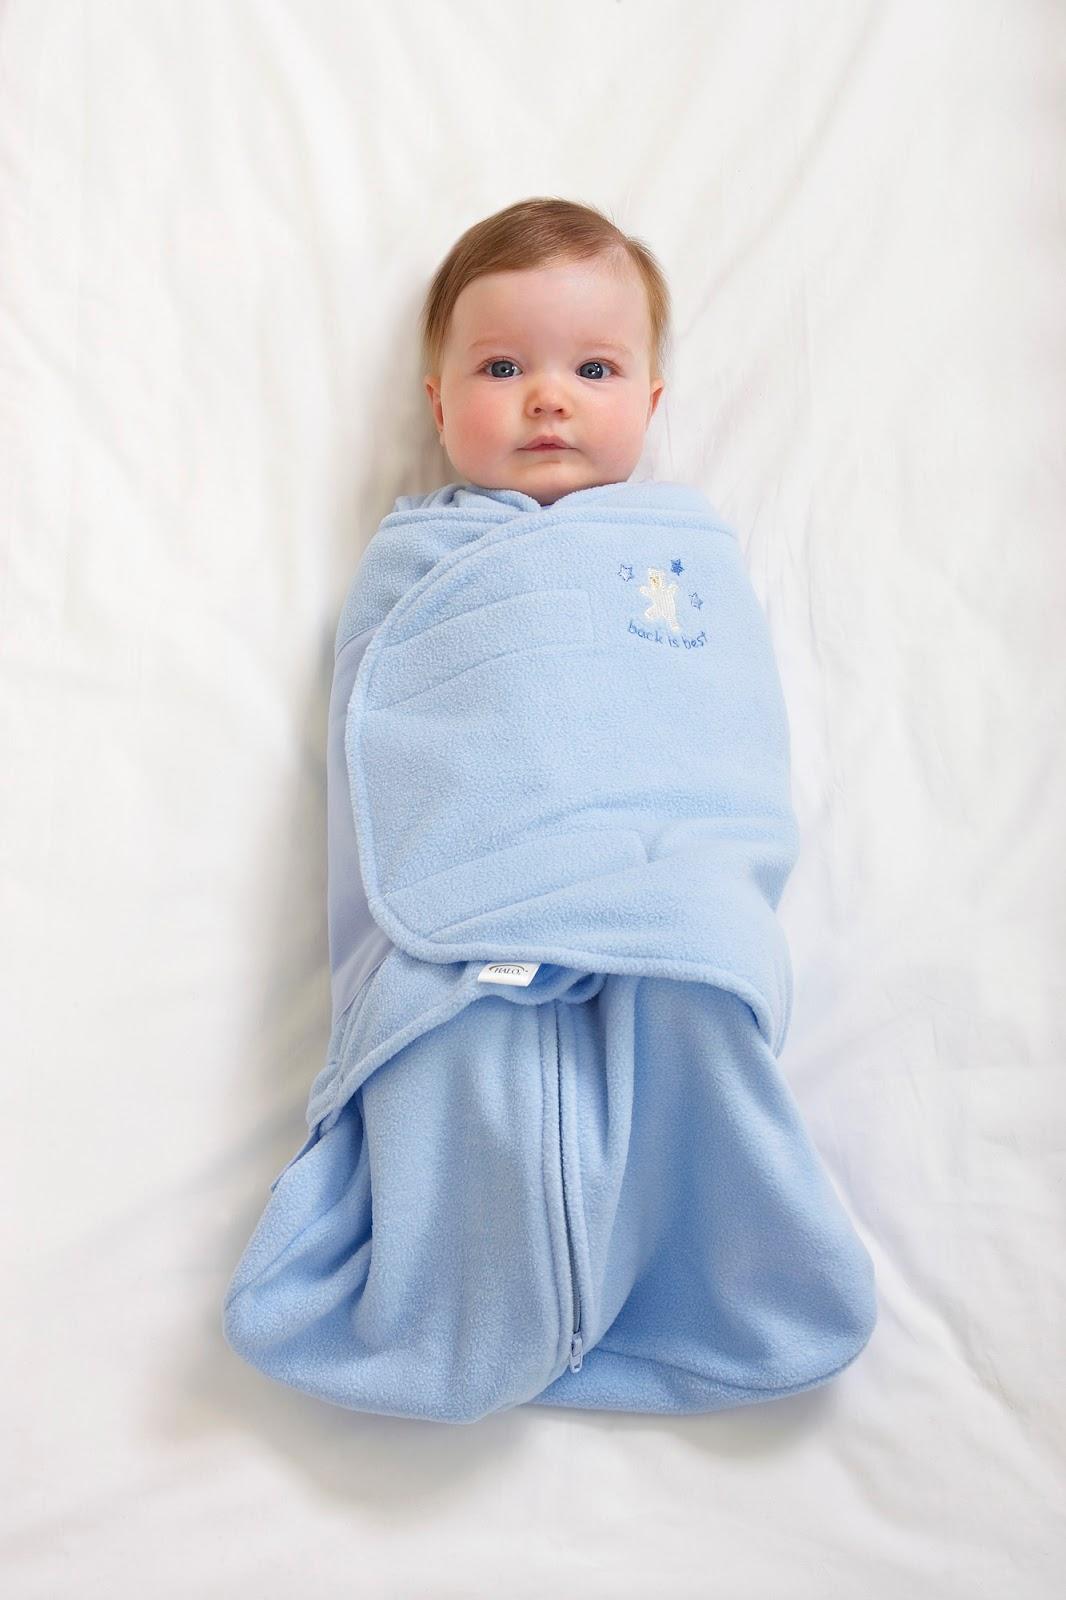 Swaddling Guide ~ My Baby Sleep Guide